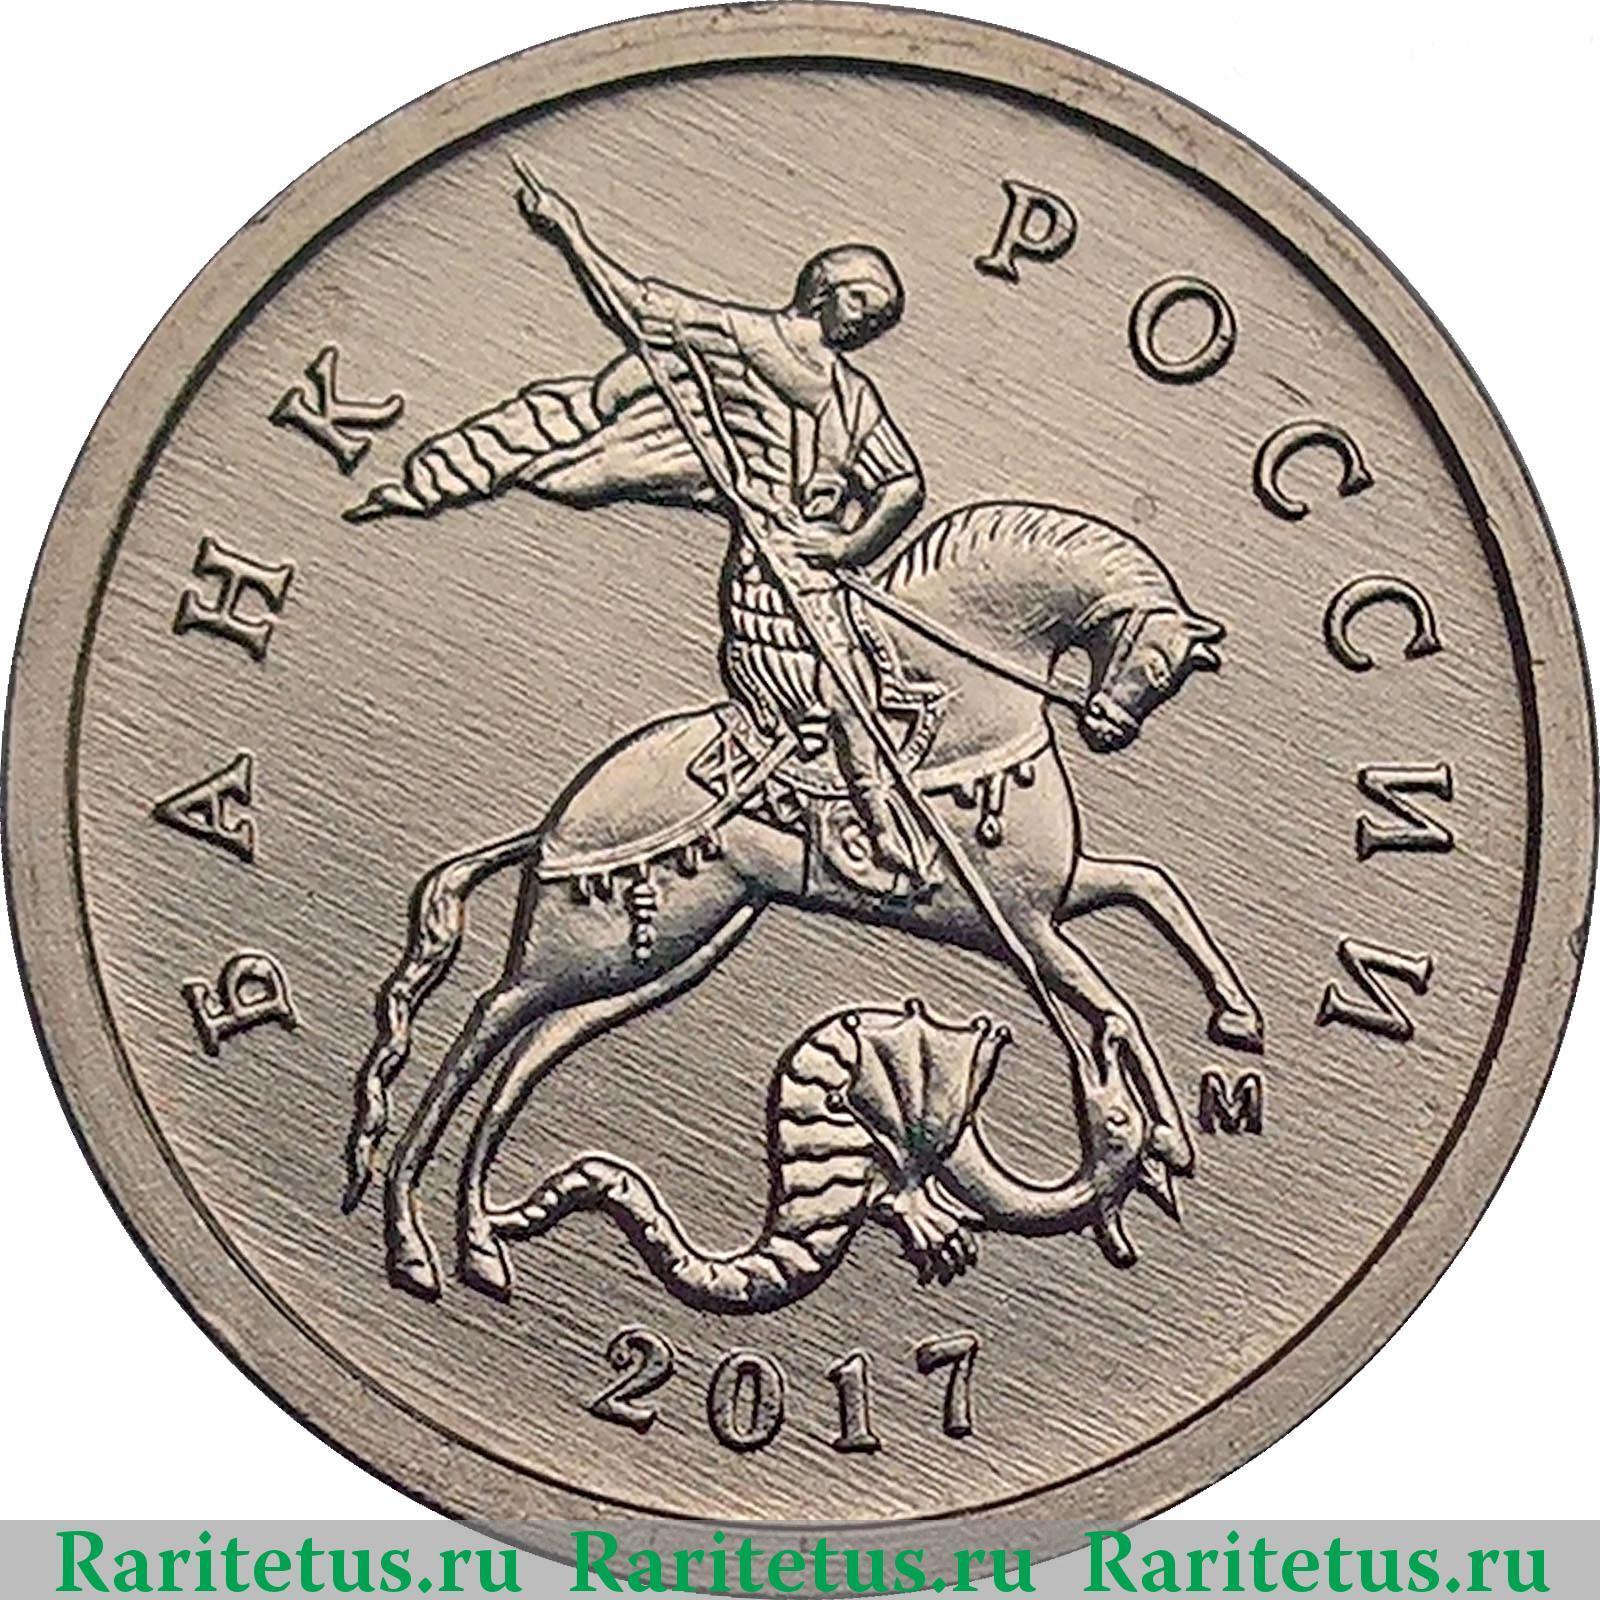 Копейка 2017 года монета нумизматика стоимость монет ссср на 2017 год